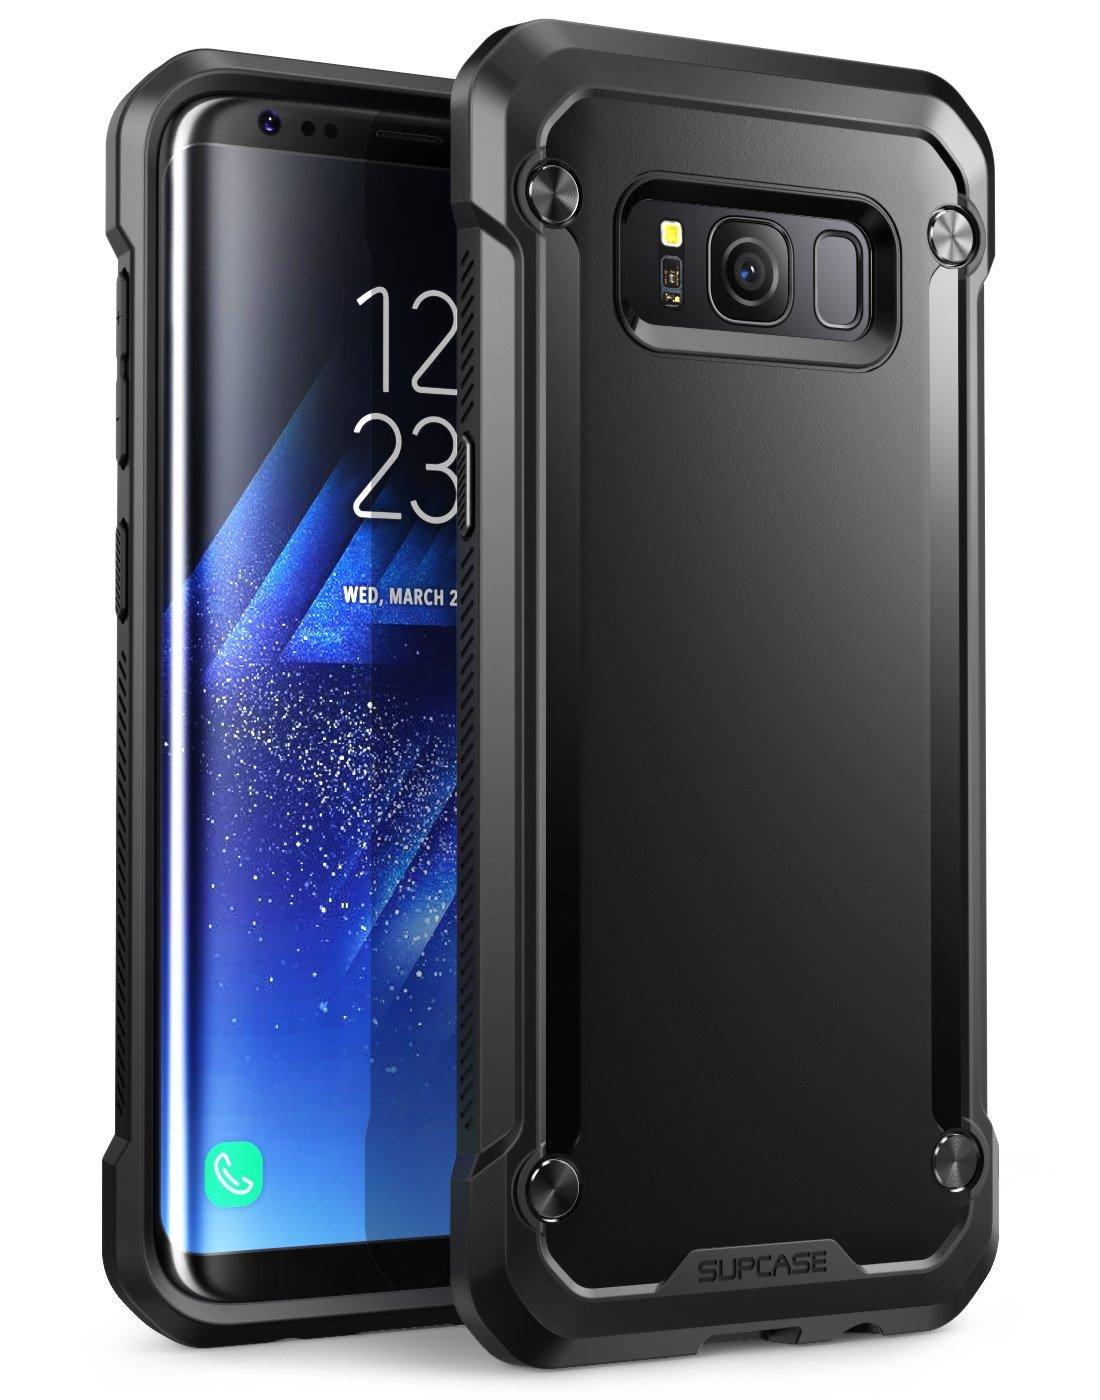 Supcase Ανθεκτική Θήκη Unicorn Beetle Premium Hybrid Samsung Galaxy S8 Plus - Black (11122)